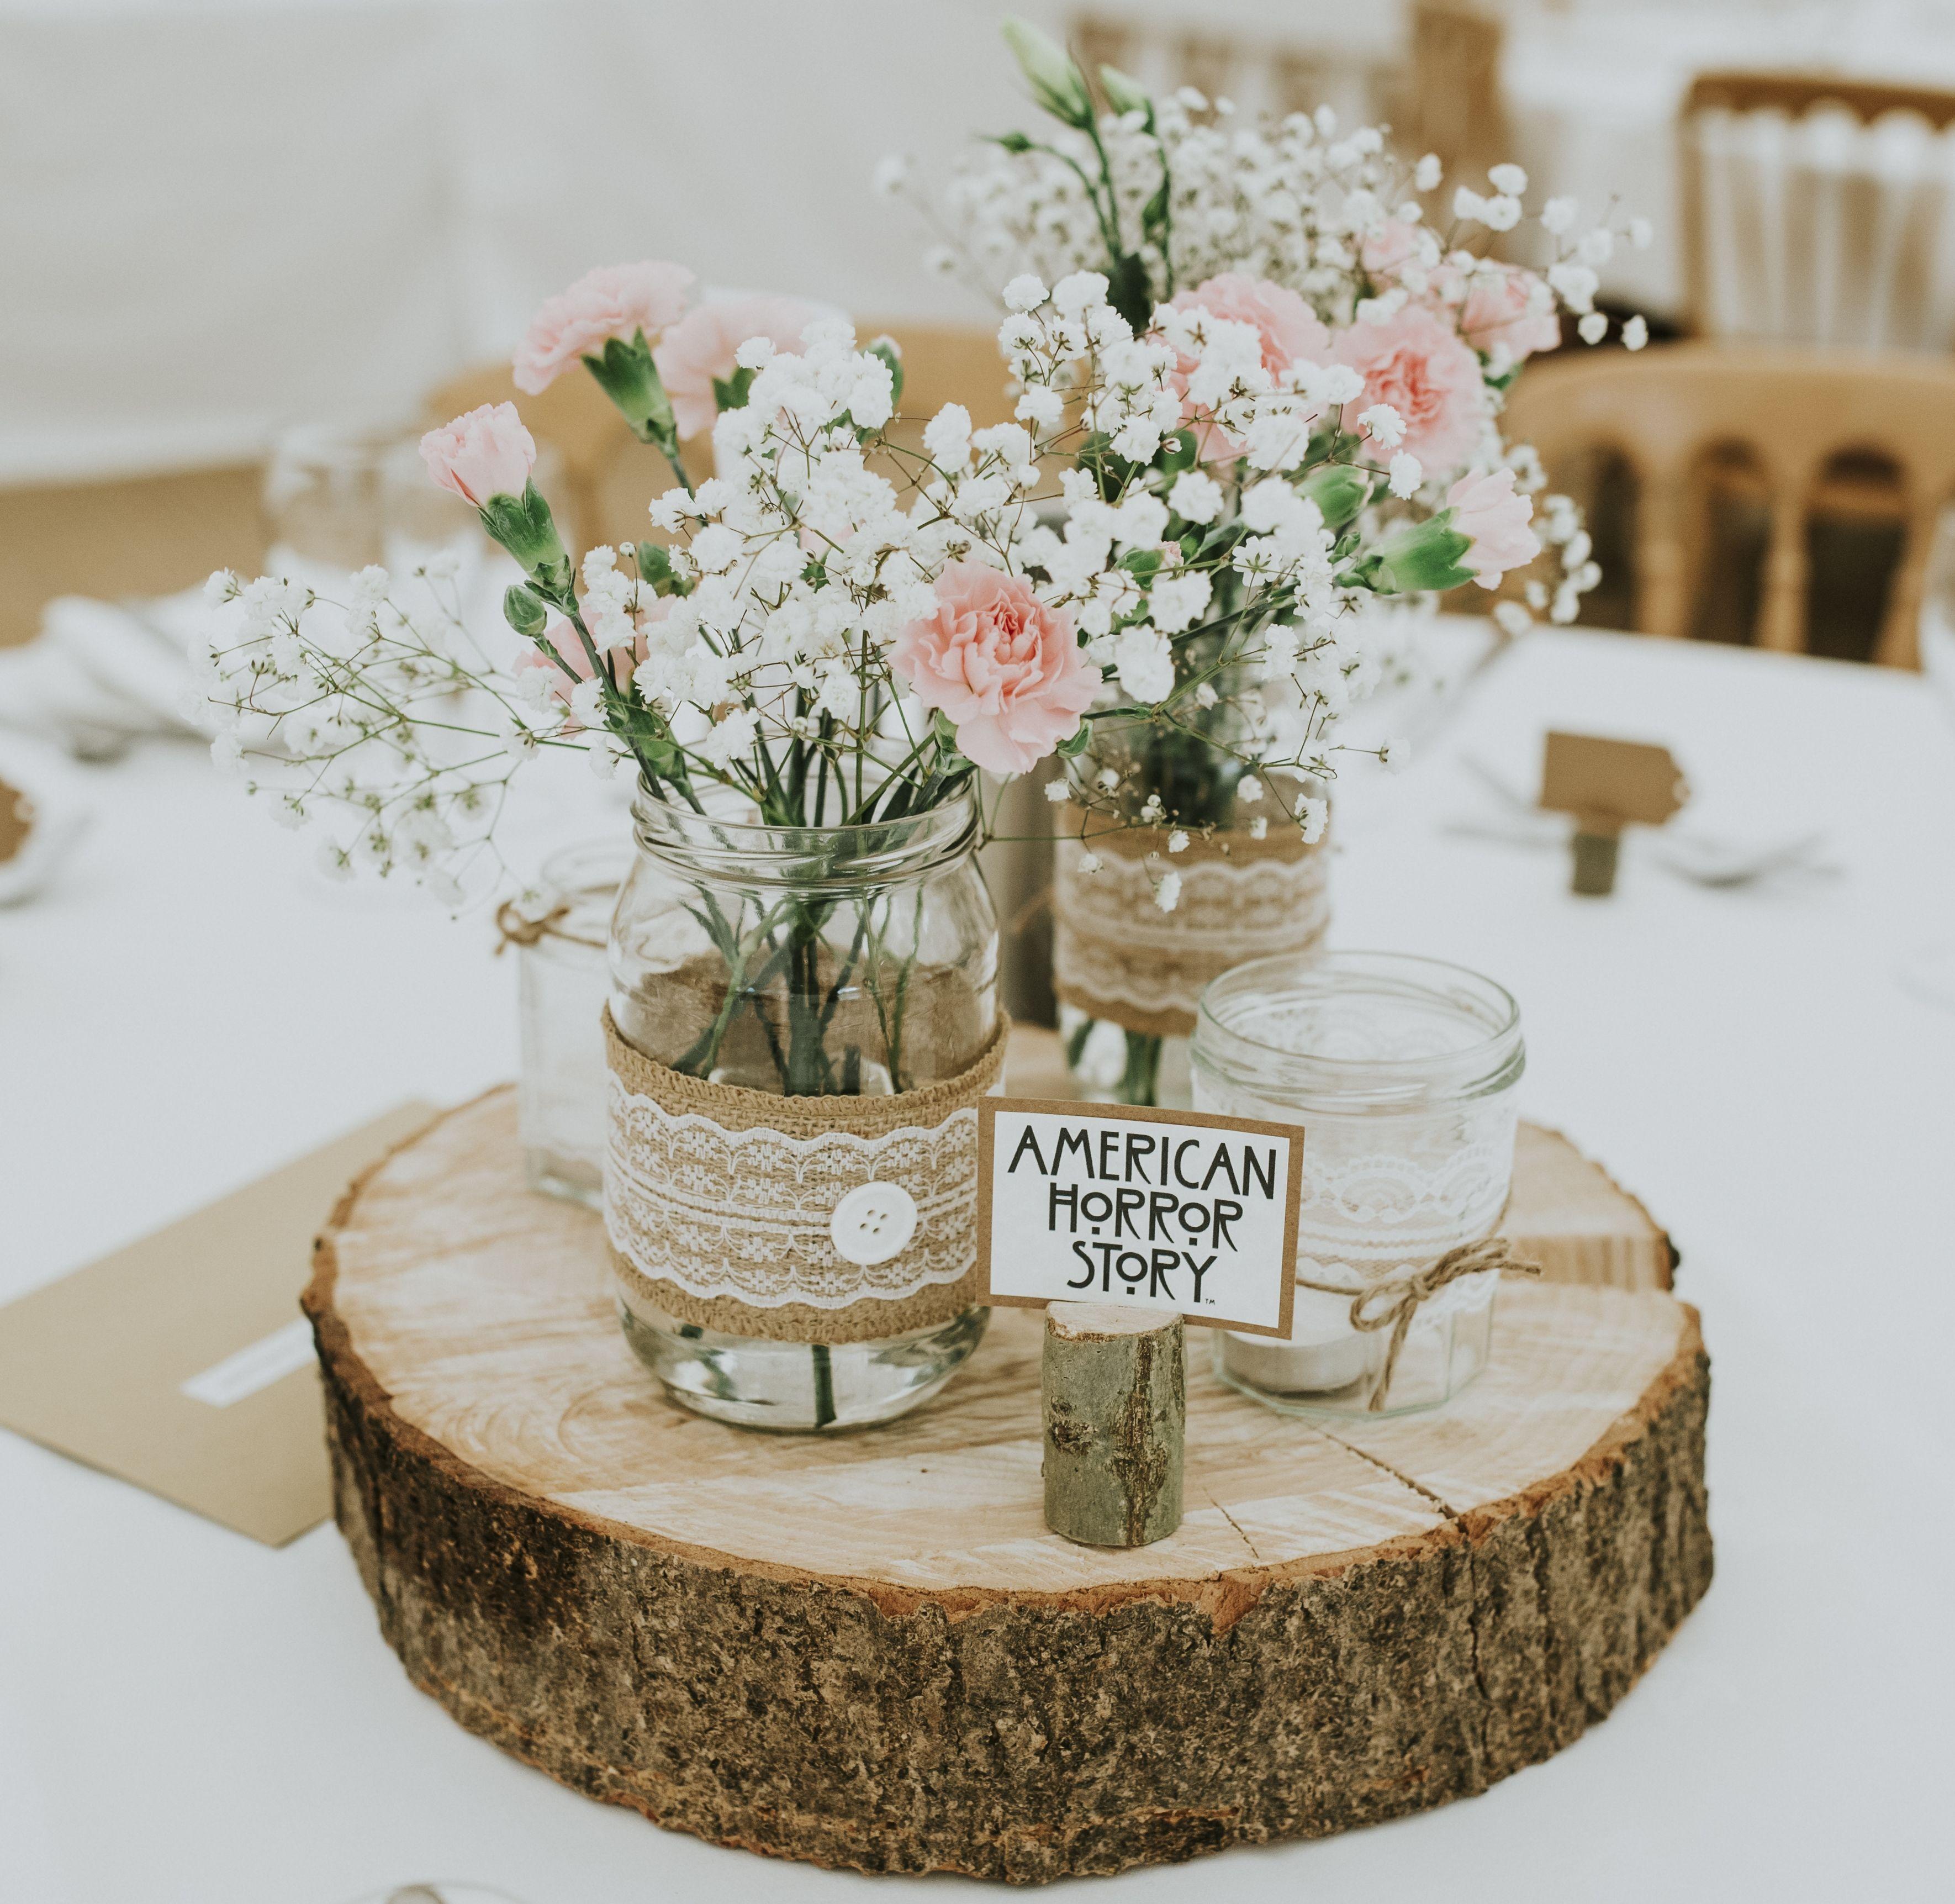 Wedding Table Decoration Ideas On A Budget: Wedding Centerpiece: Jam Jars, Hessian, Lace On Log Slices